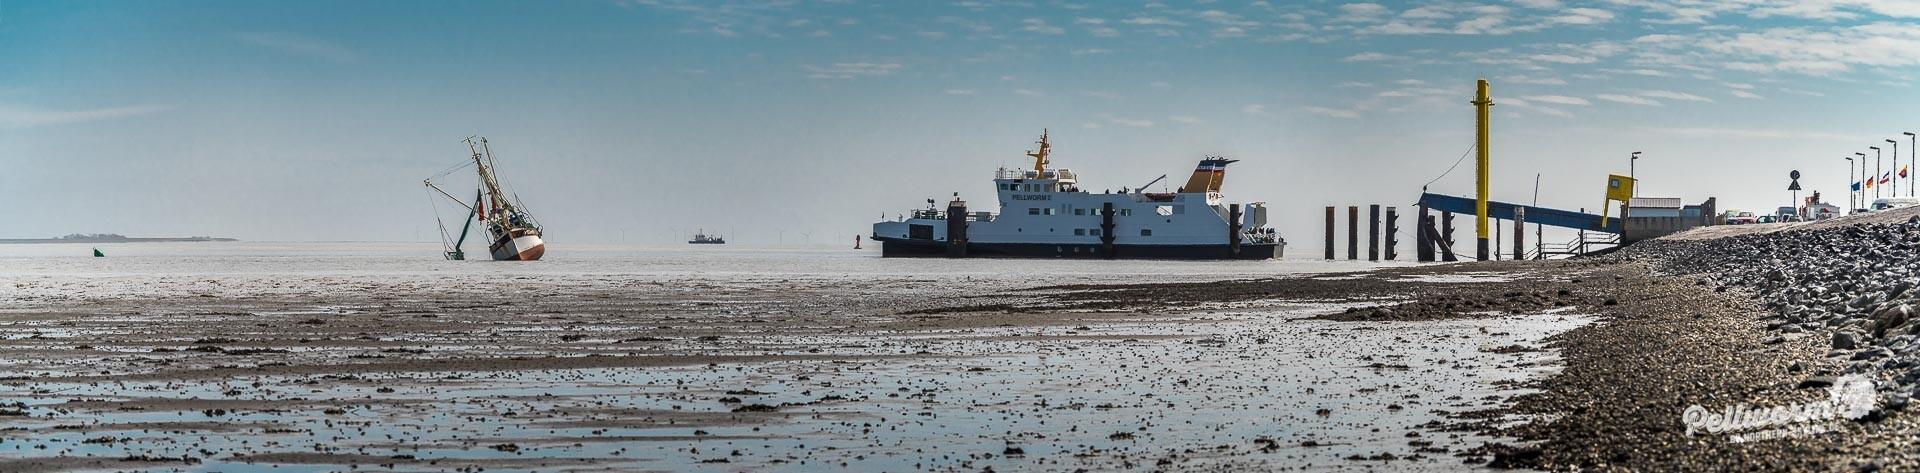 Panorama am Tiefwasseranleger auf Pellworm